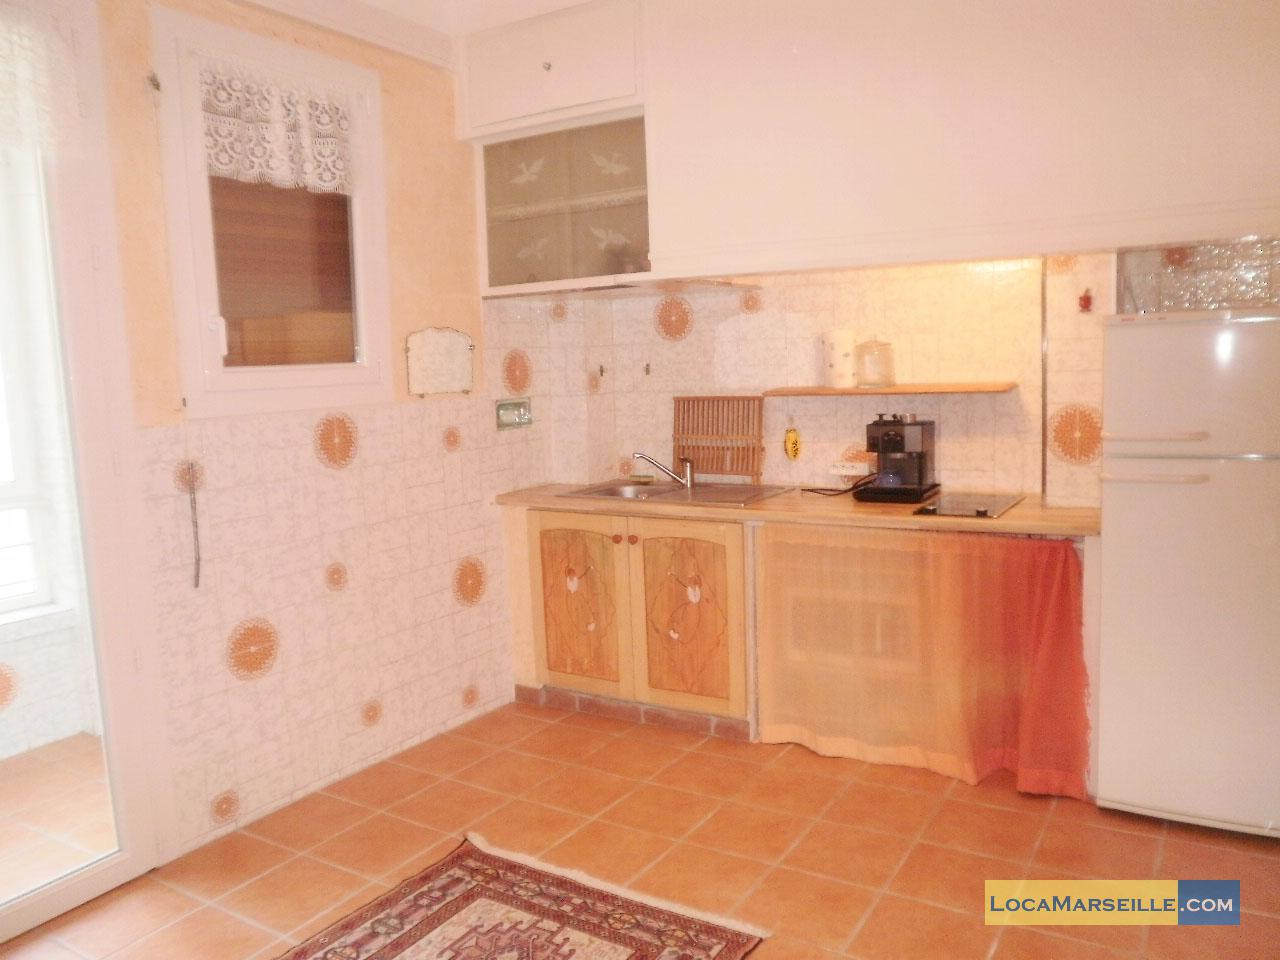 location meubl e marseille appartement type t1 studio studio joly. Black Bedroom Furniture Sets. Home Design Ideas